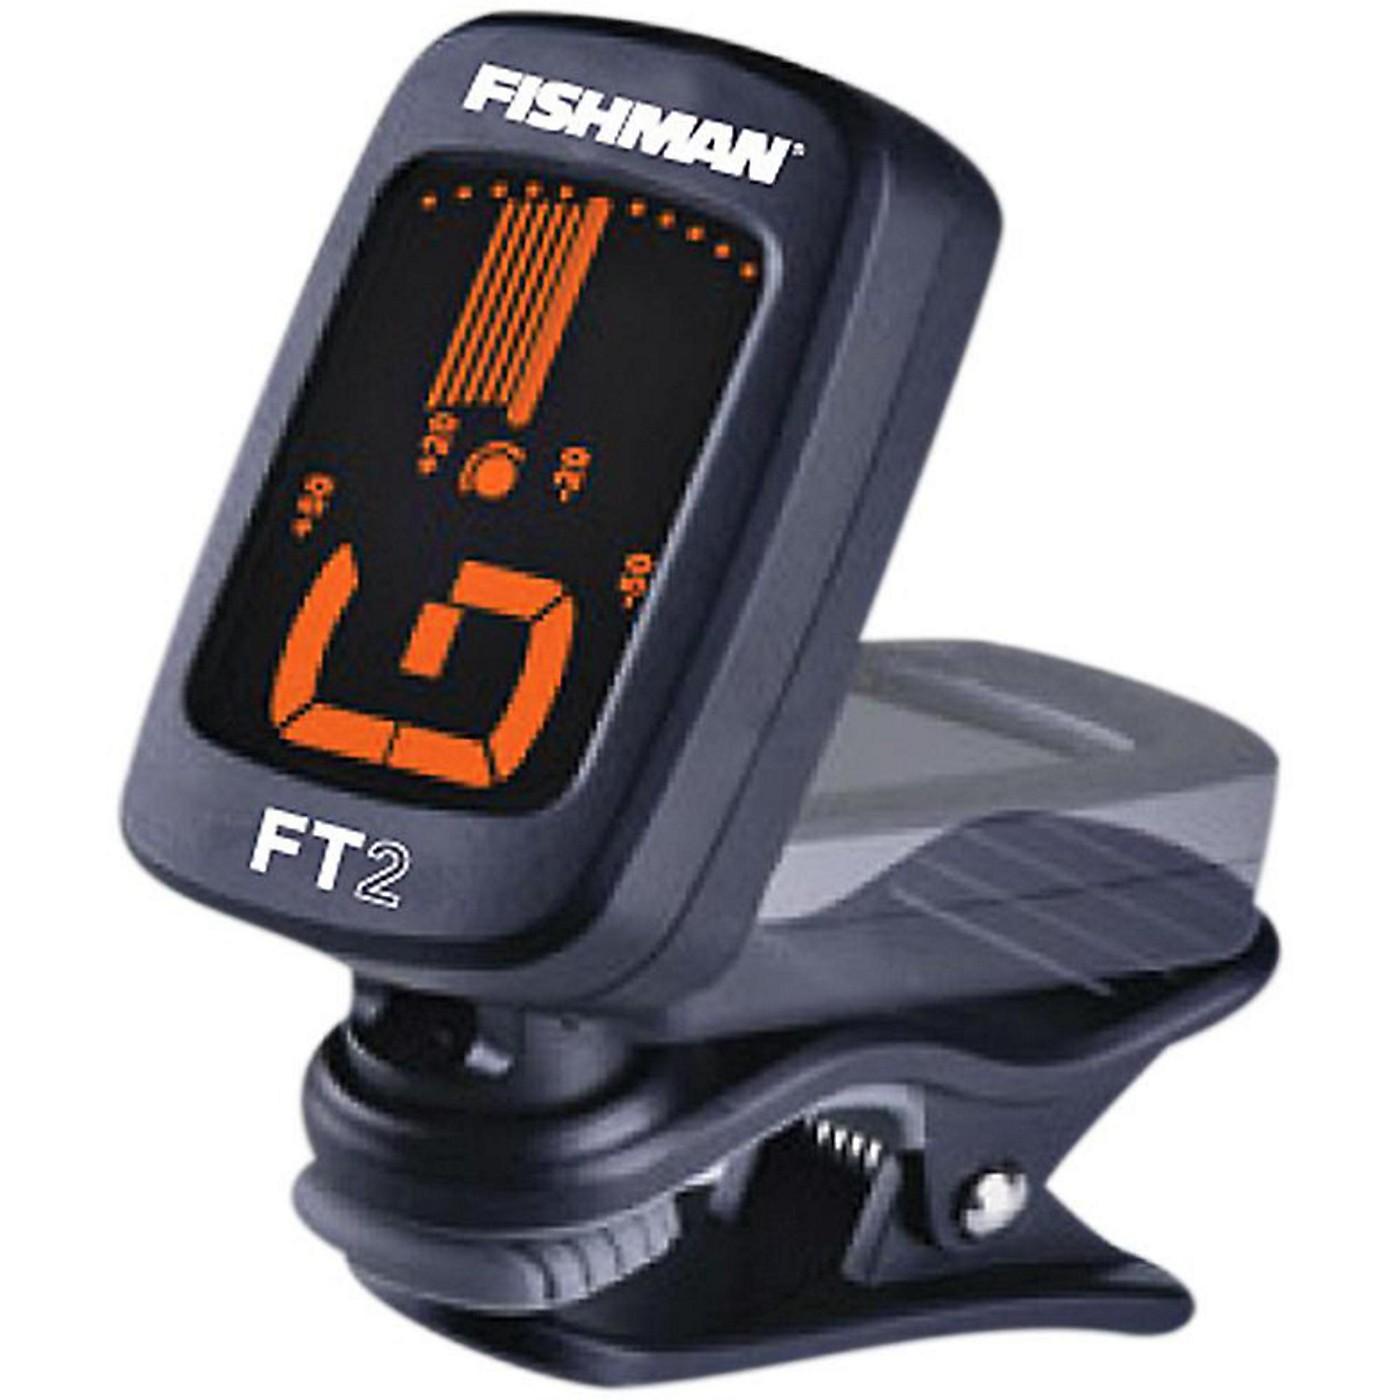 Fishman FT-2 Digital Chromatic Clip-On Tuner thumbnail